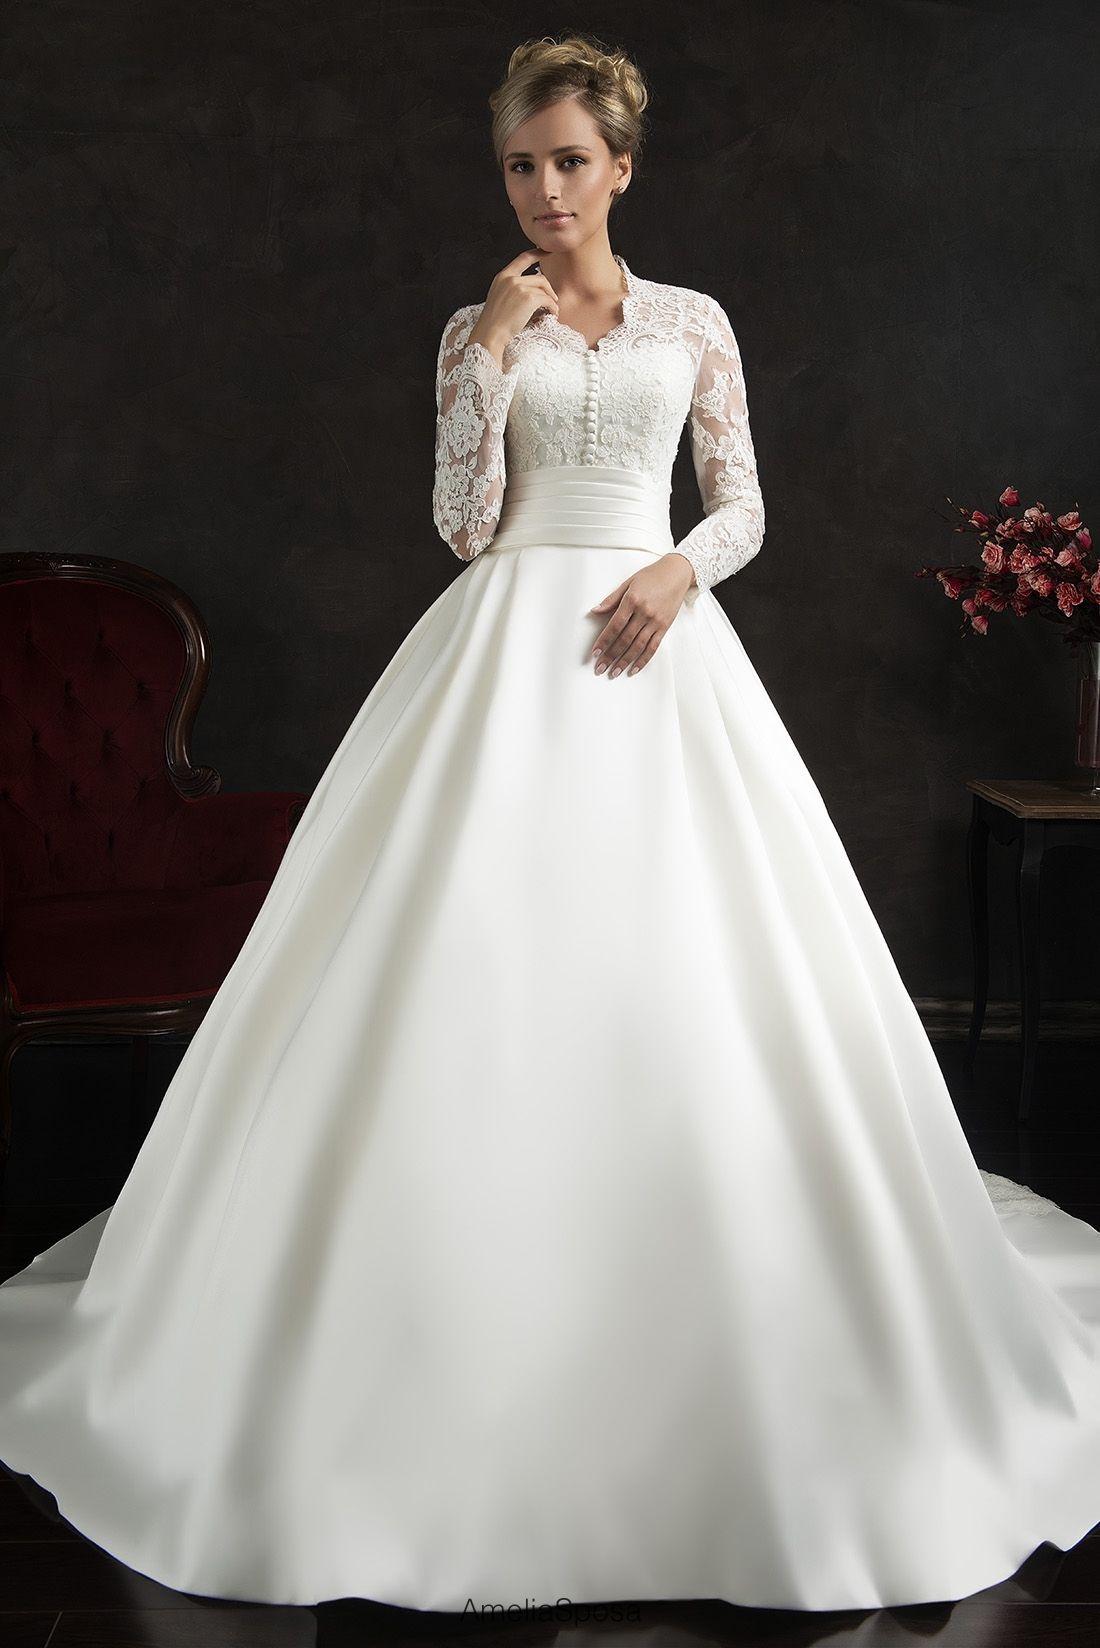 Robe Mariée Mariage Juif Jewish wedding